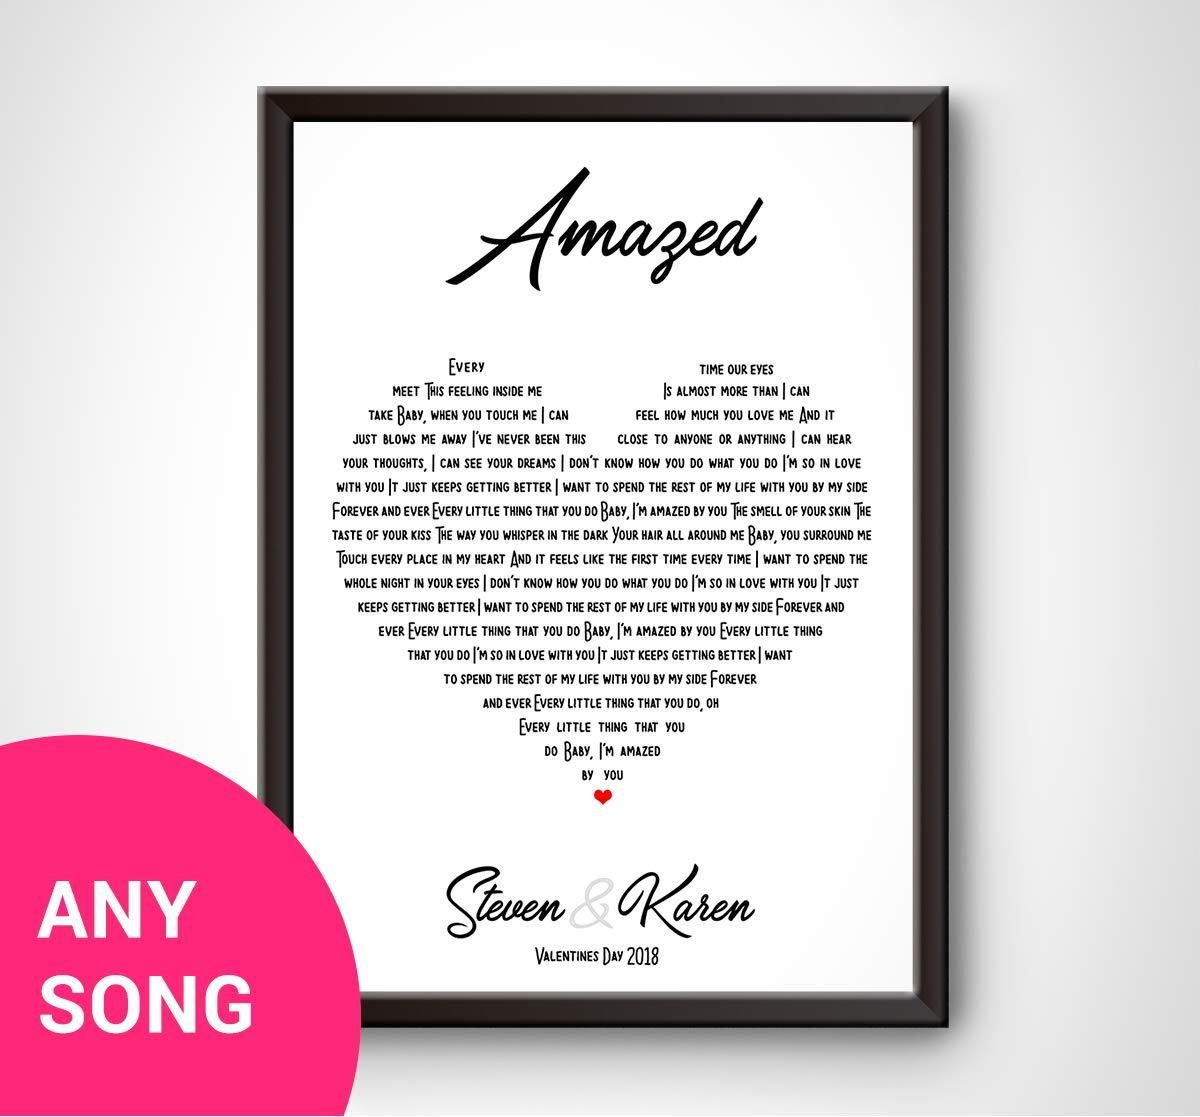 b14f046770c PERSONALISED Song Lyrics Wall Art Print - ANY SONG - HEART - Gift idea for  wedding